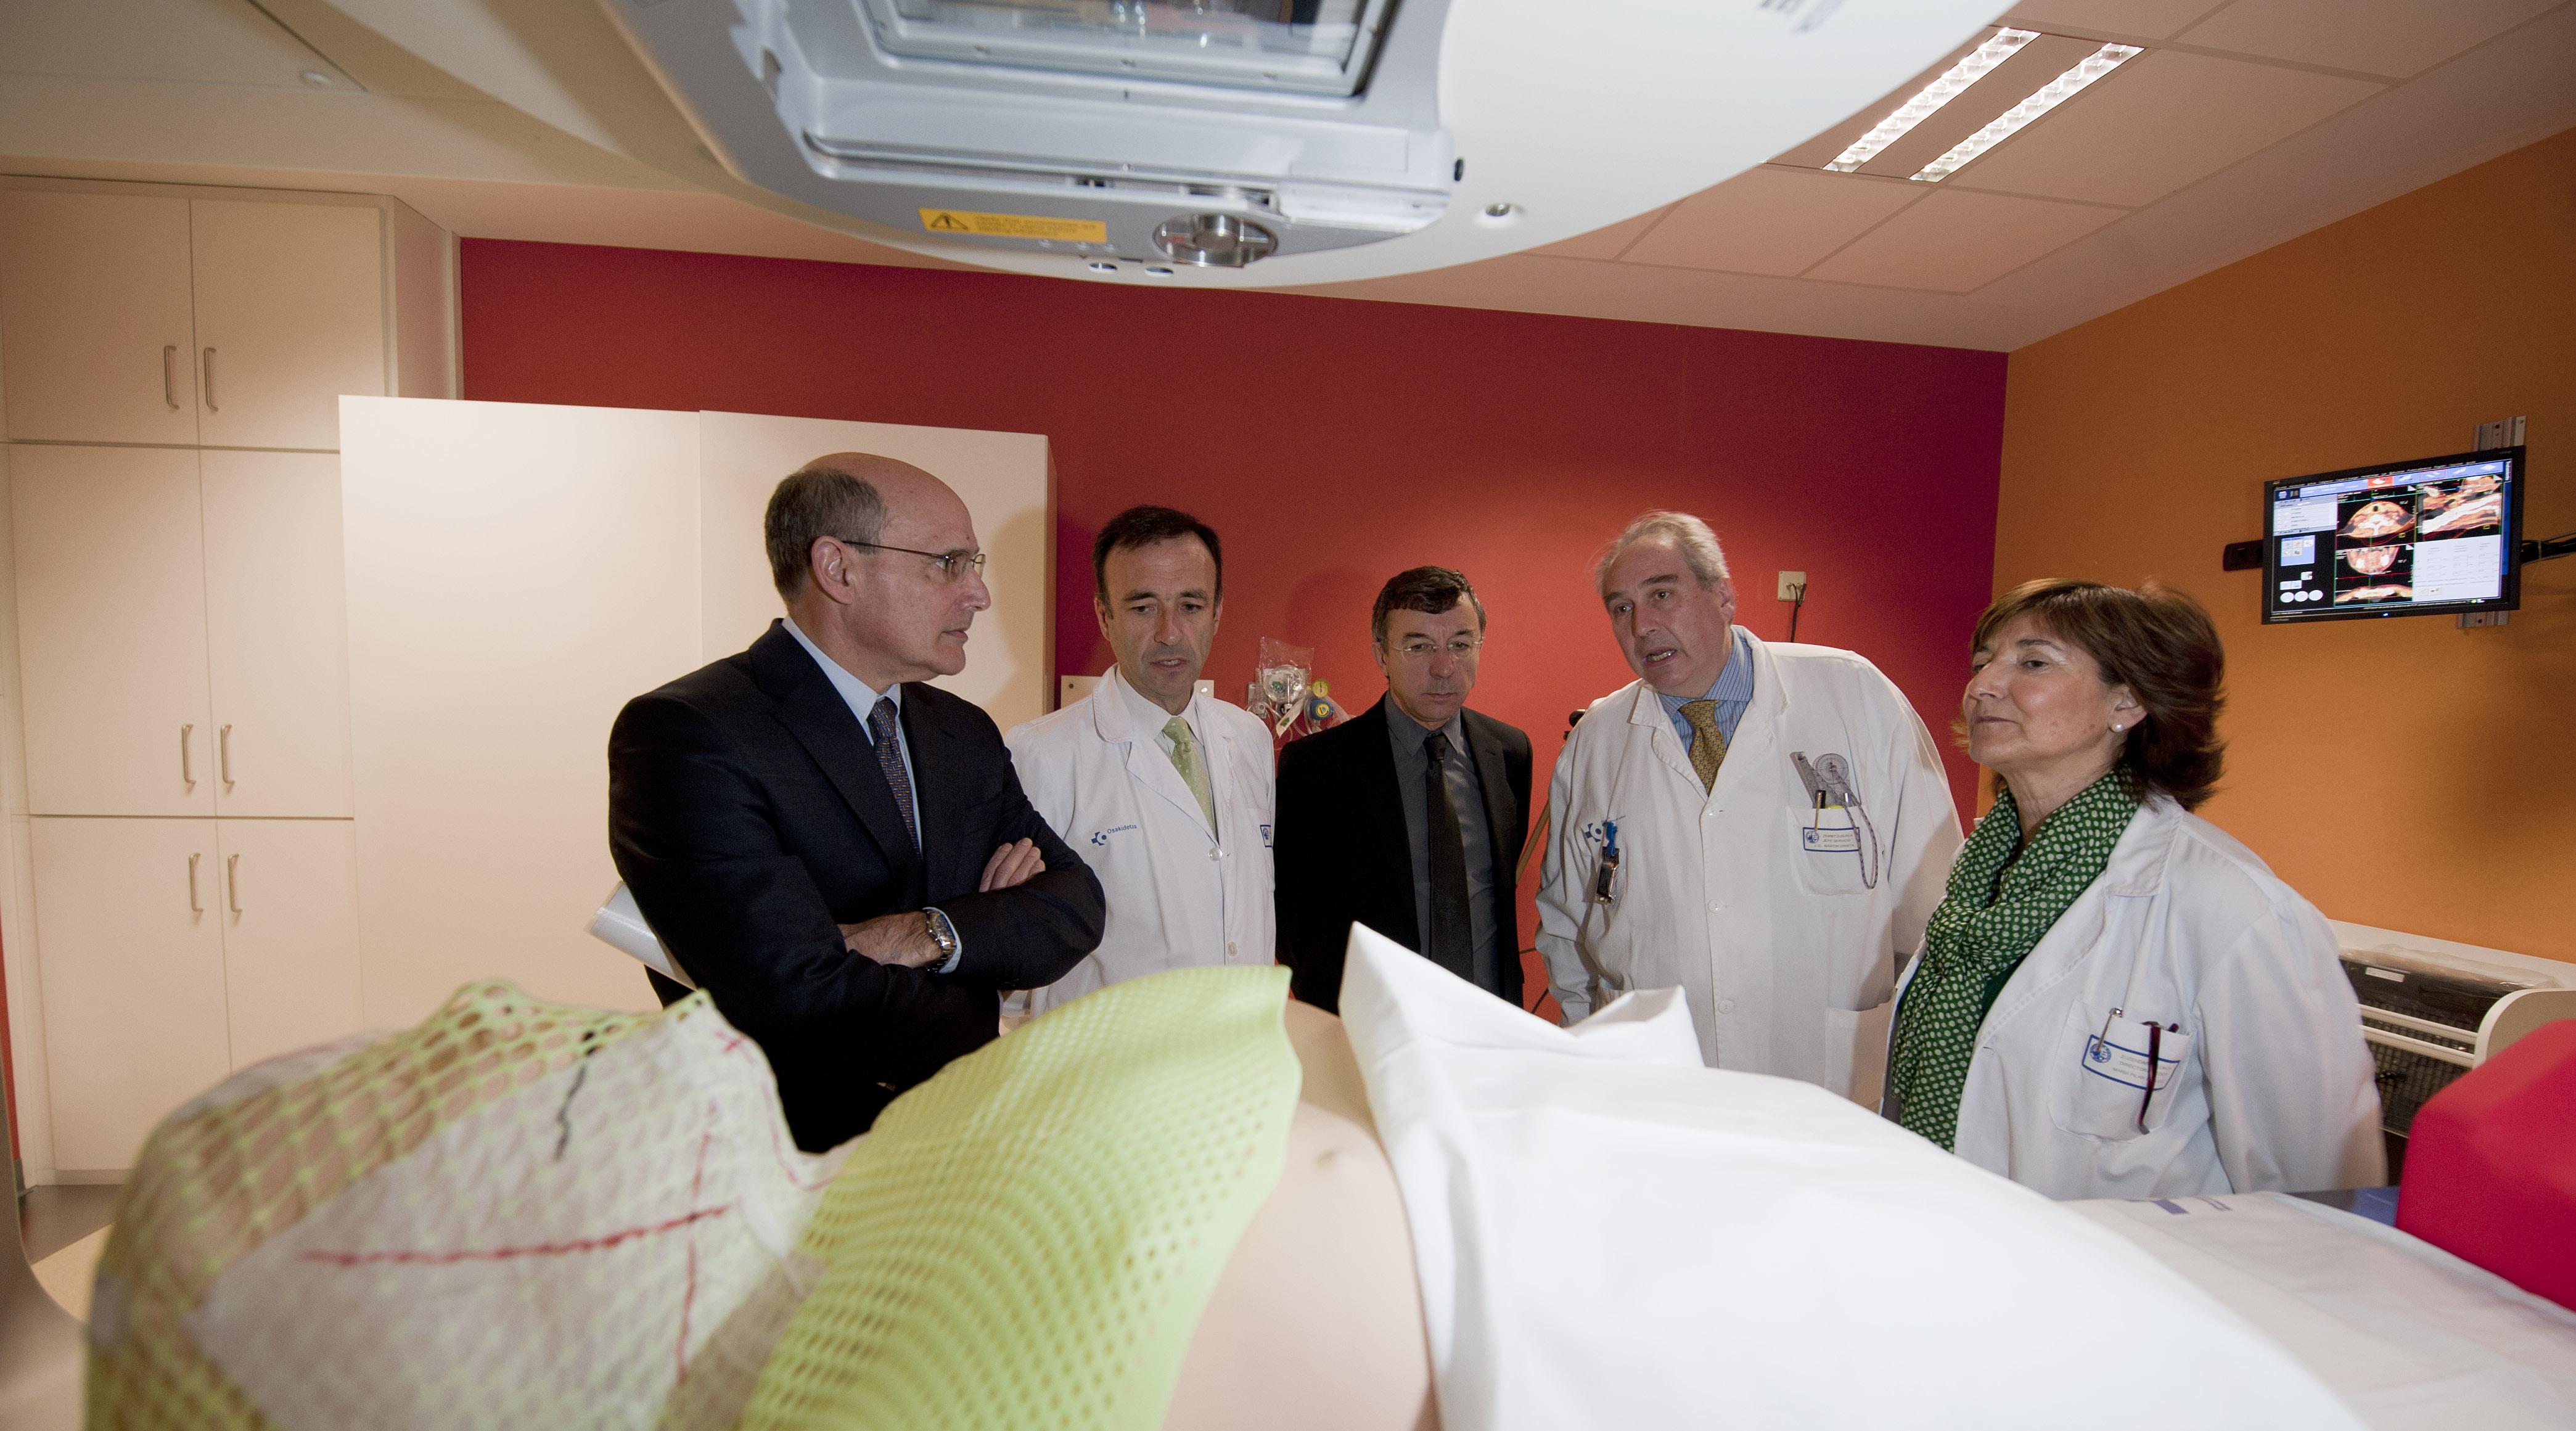 basurto_hospital10.jpg